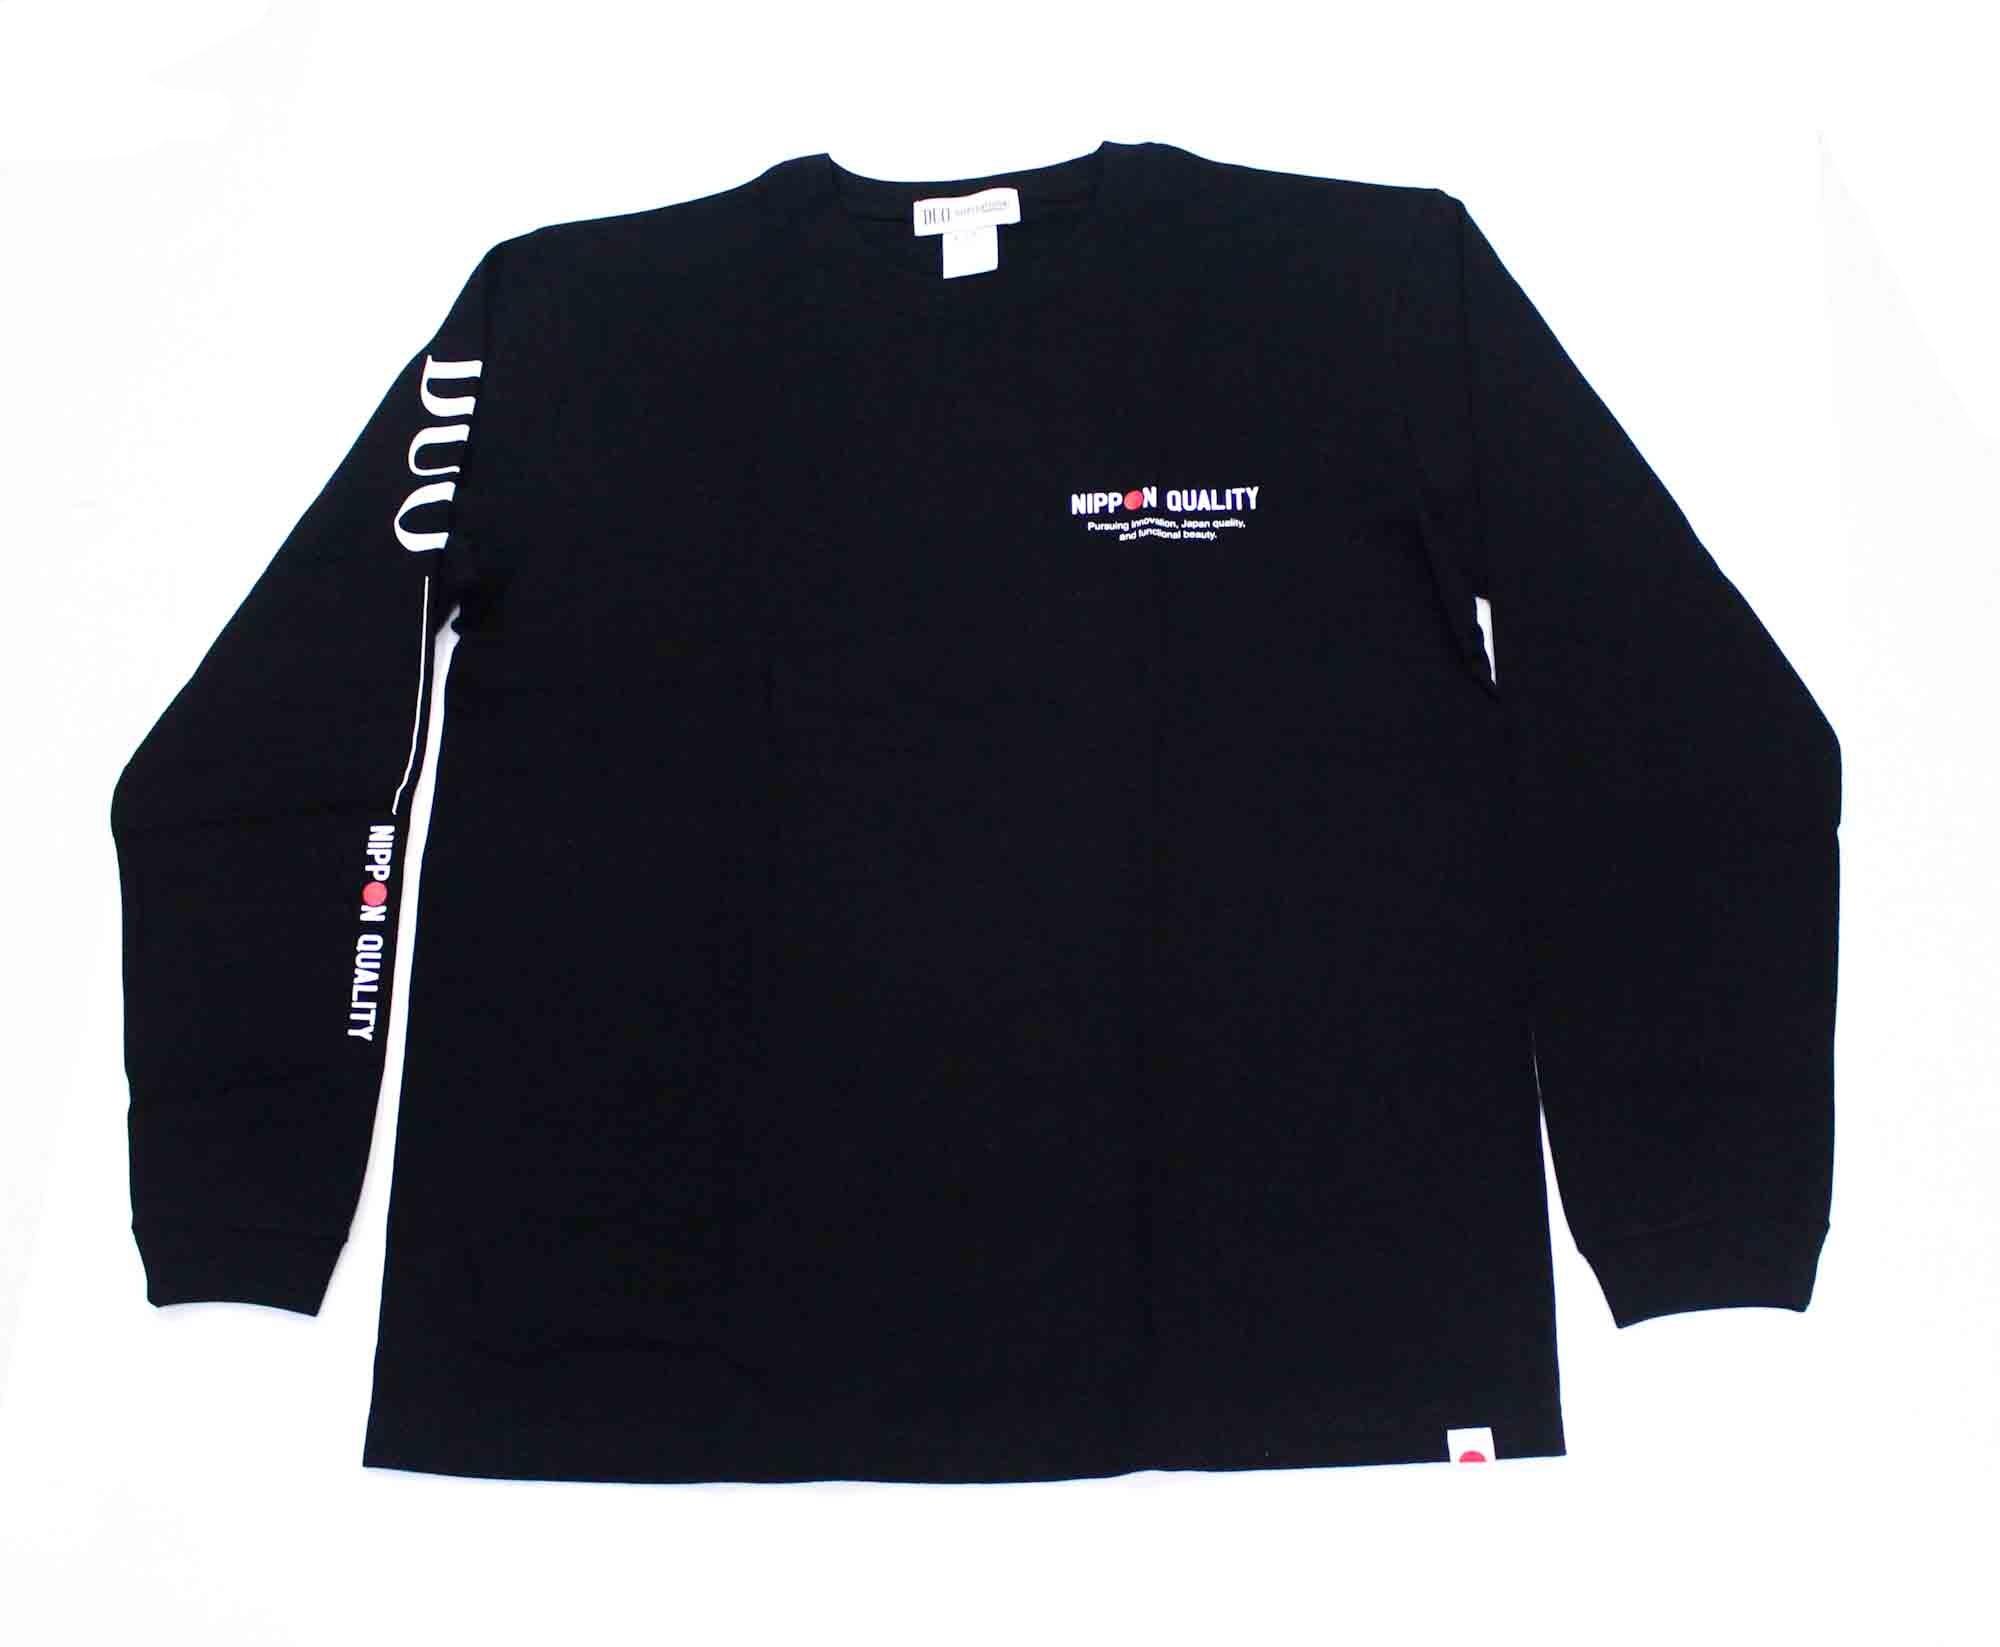 Duo T Shirt Long Sleeve 2021 Black Size L (1027)